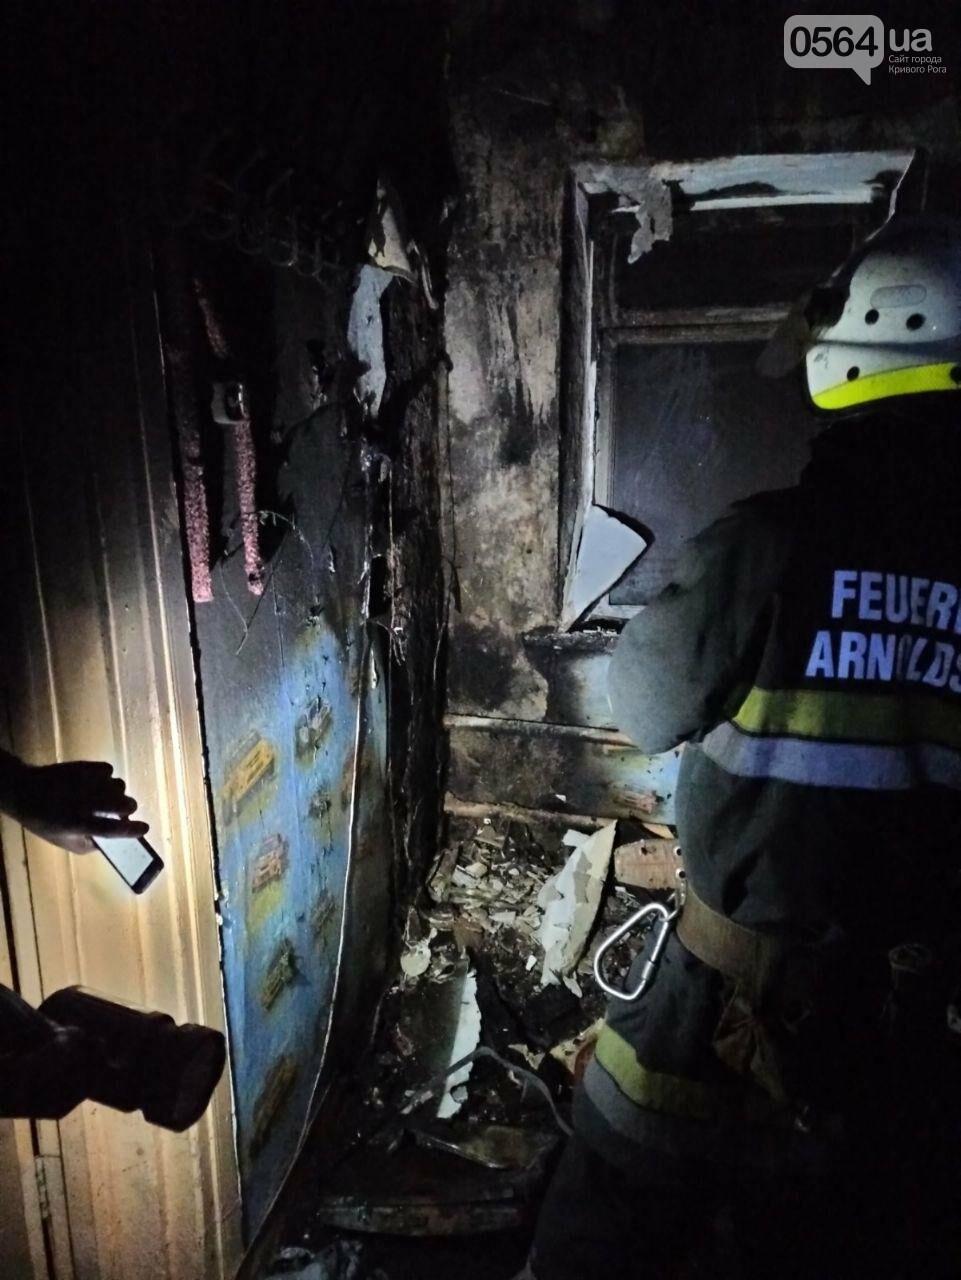 Во время пожара в Кривом Роге пострадал 70-летний пенсионер, - ФОТО , фото-2